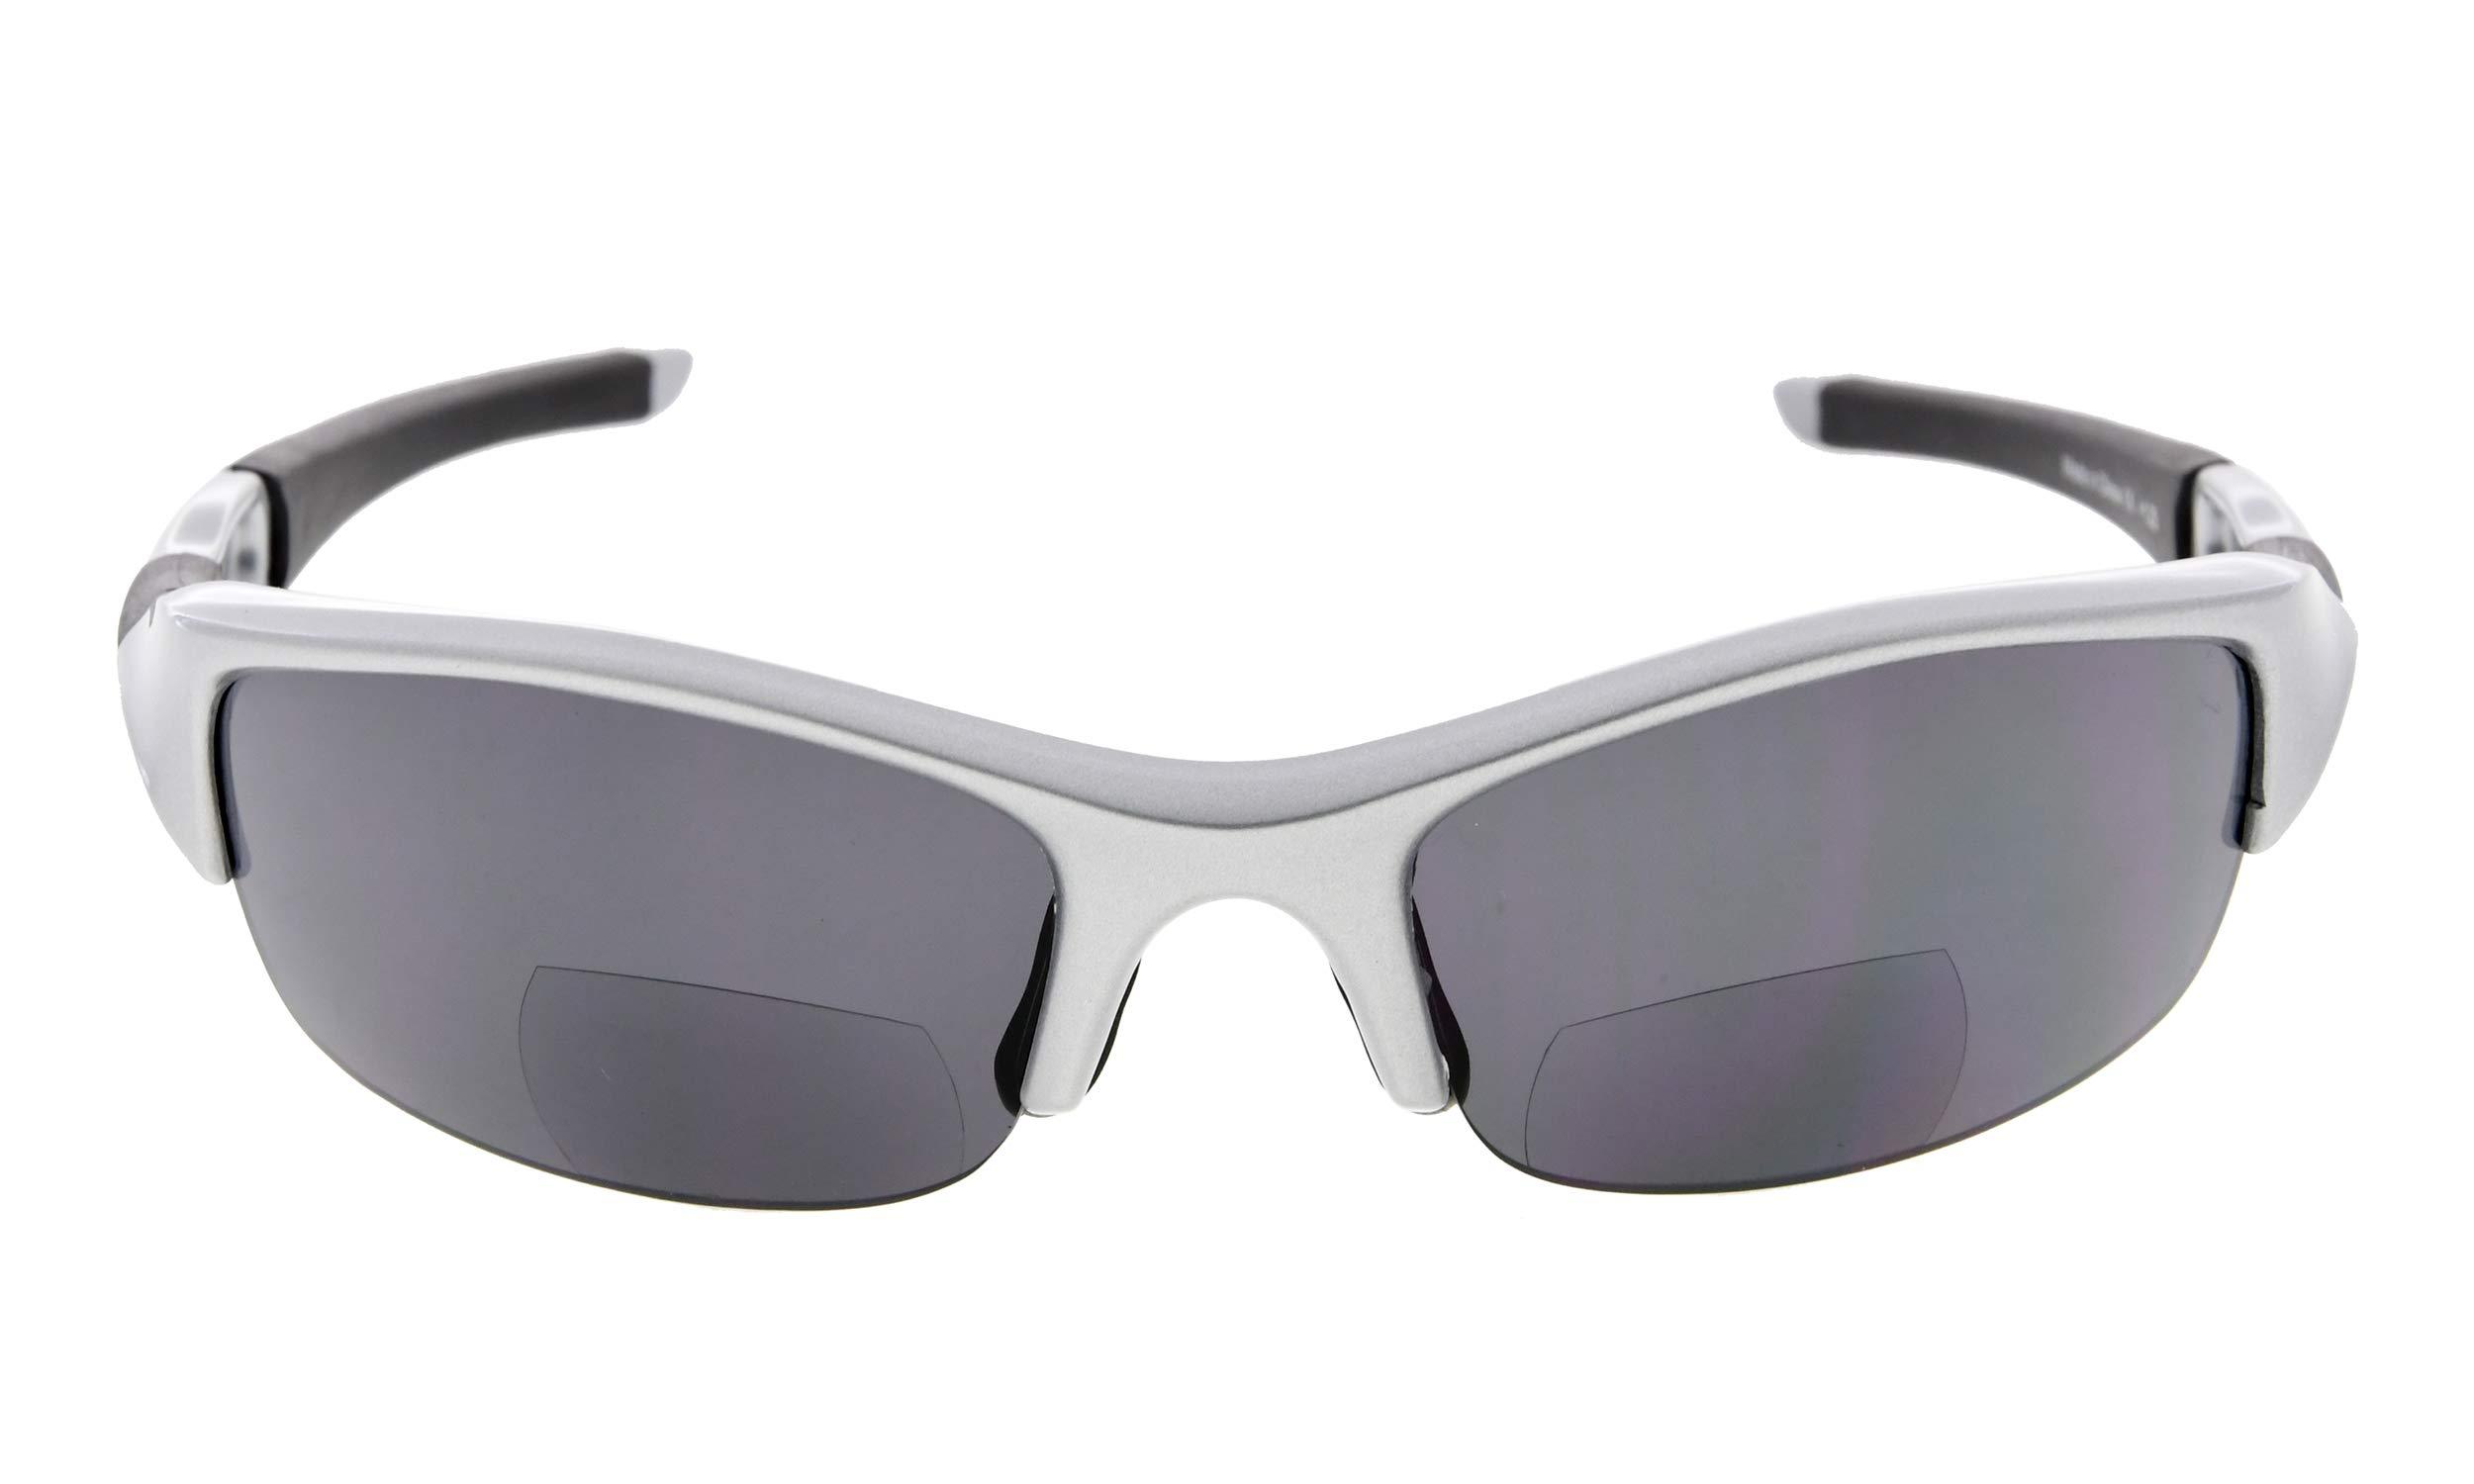 7bd8735aee323 Eyekepper TR90 Unbreakable Half-Rim Sports Bifocal Sunglasses Baseball  Running Fishing Driving Golf Softball Hiking Reading Glasses ...